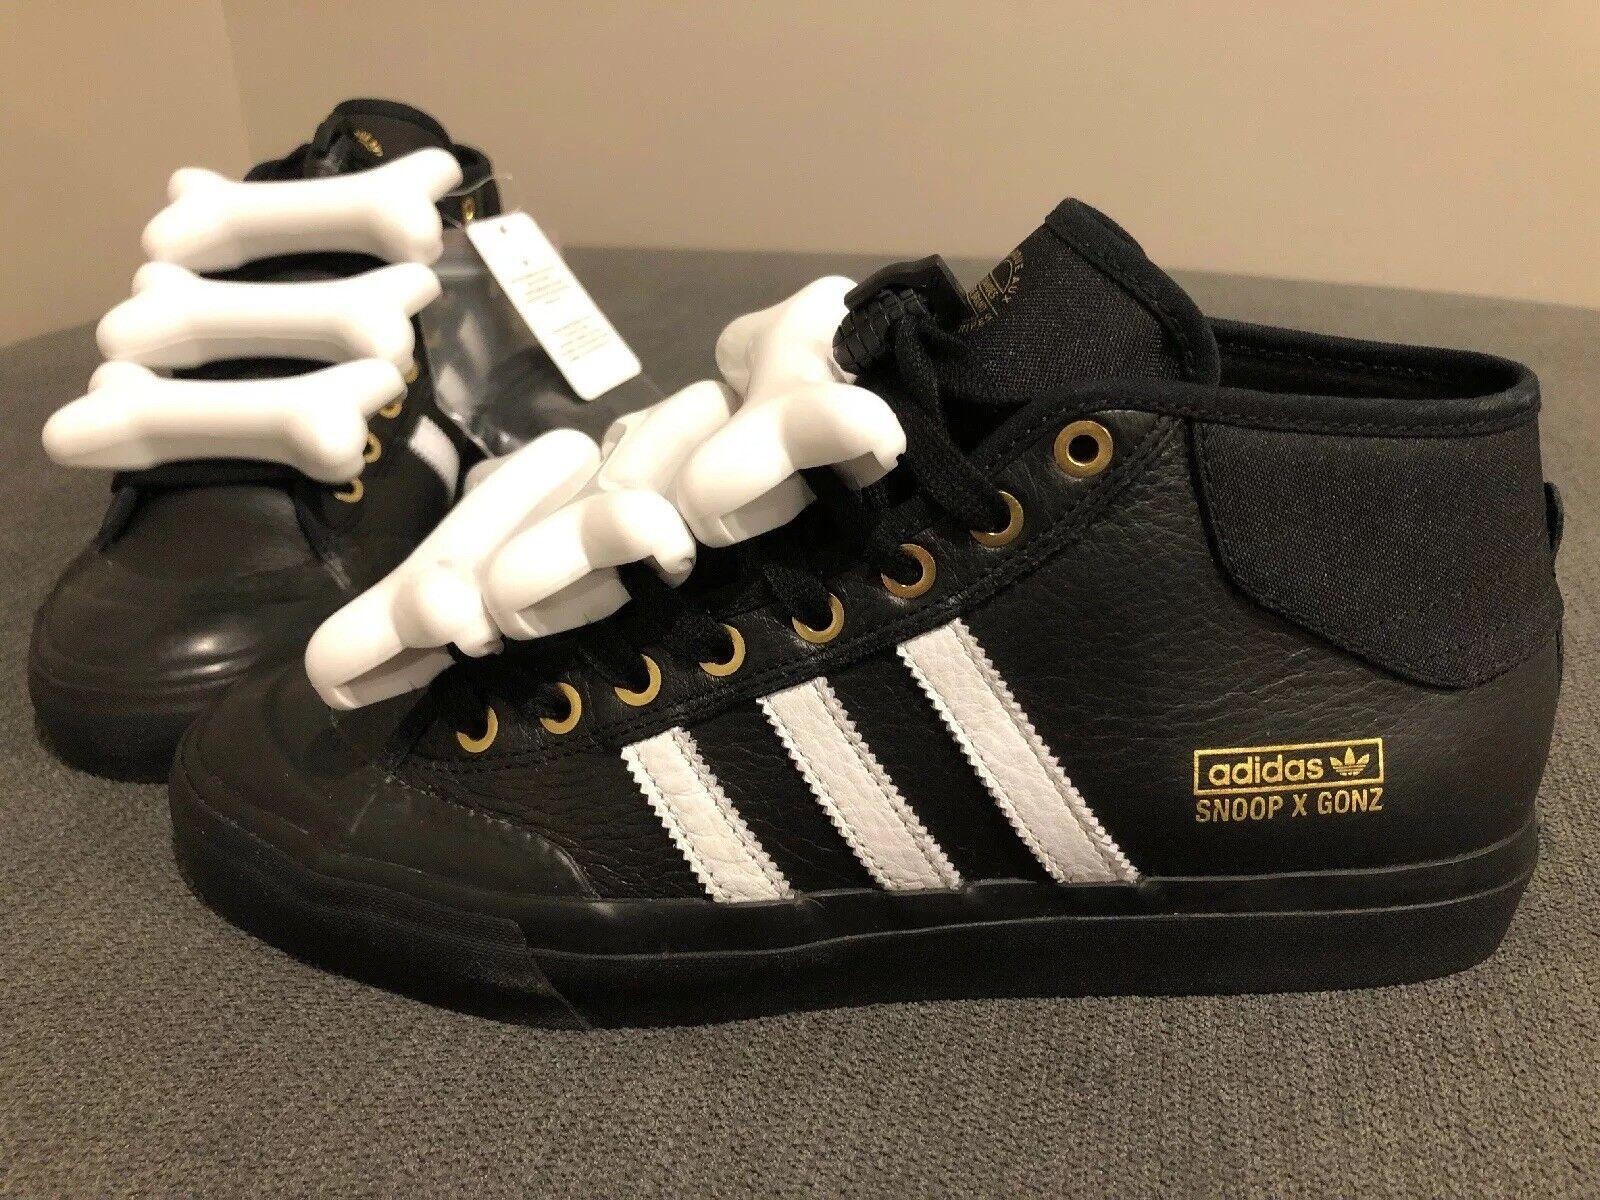 Adidas, Snoop Dogg, Jeremy Scott Bones Tribute, Size 9.5, Rare